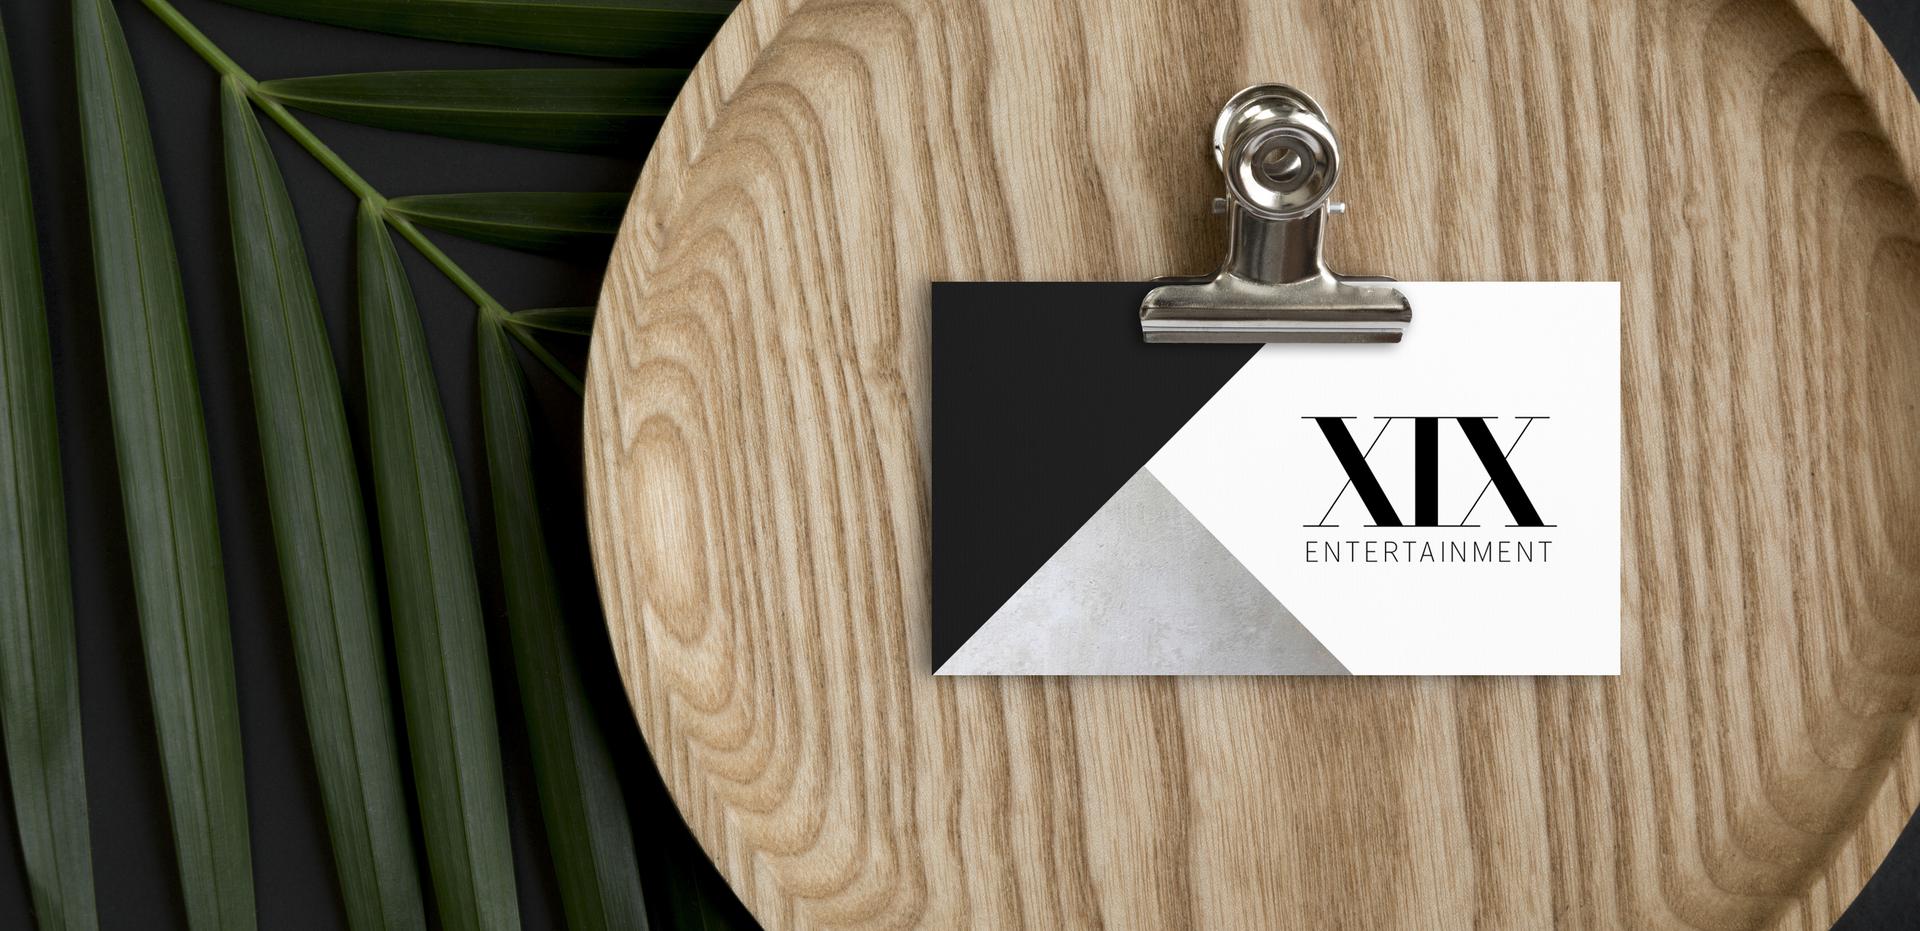 XIX Entertainment Logo Design by Kaitlynn Stone